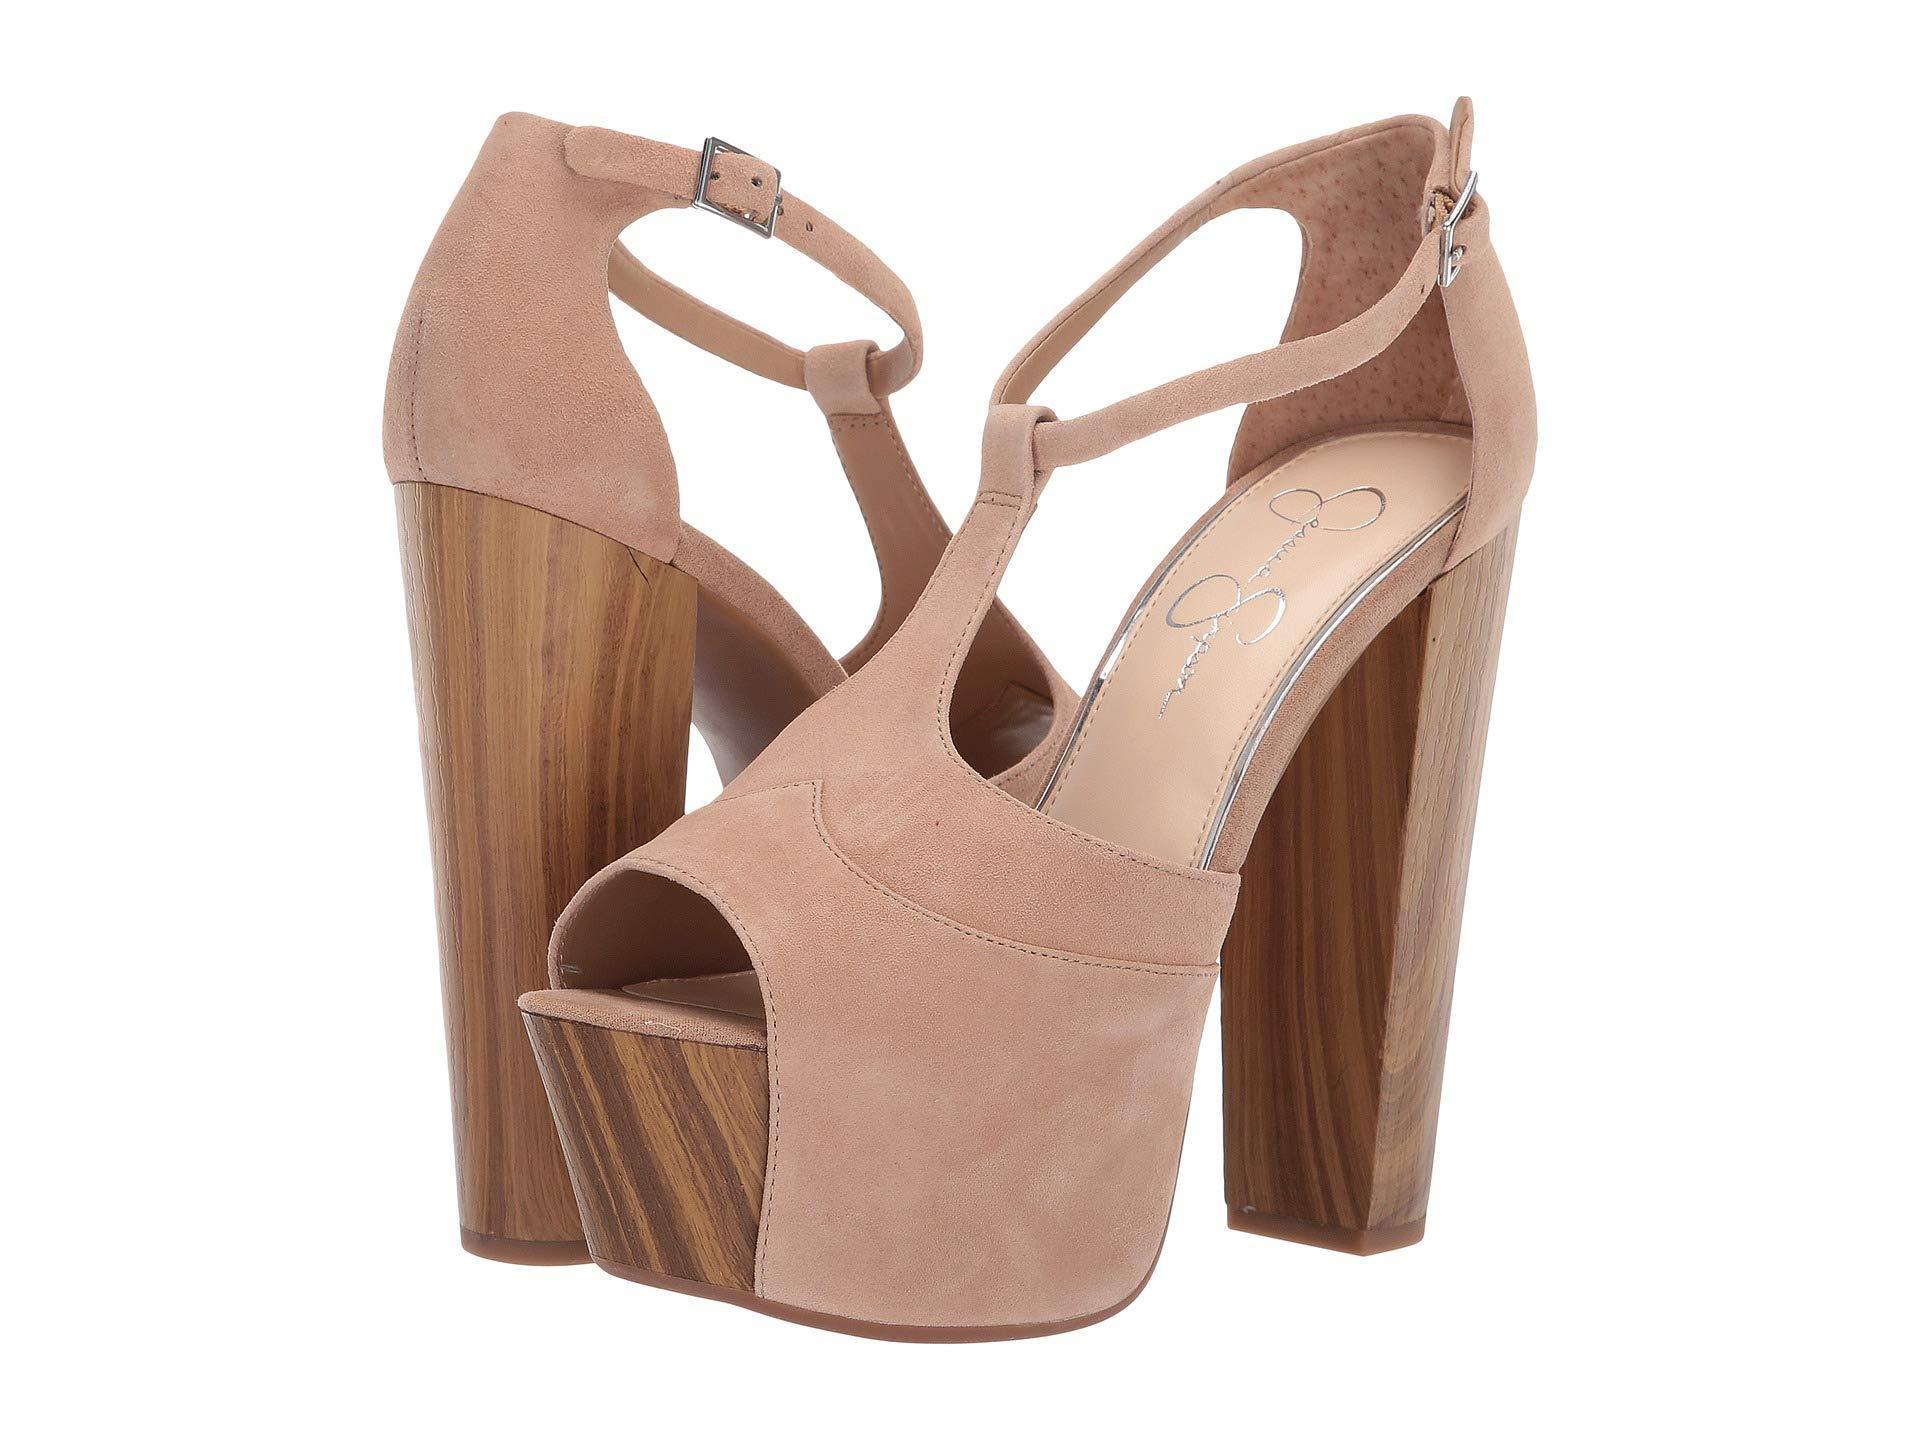 b0b1539fae7 Jessica Simpson. Women s Dany (sand) High Heels